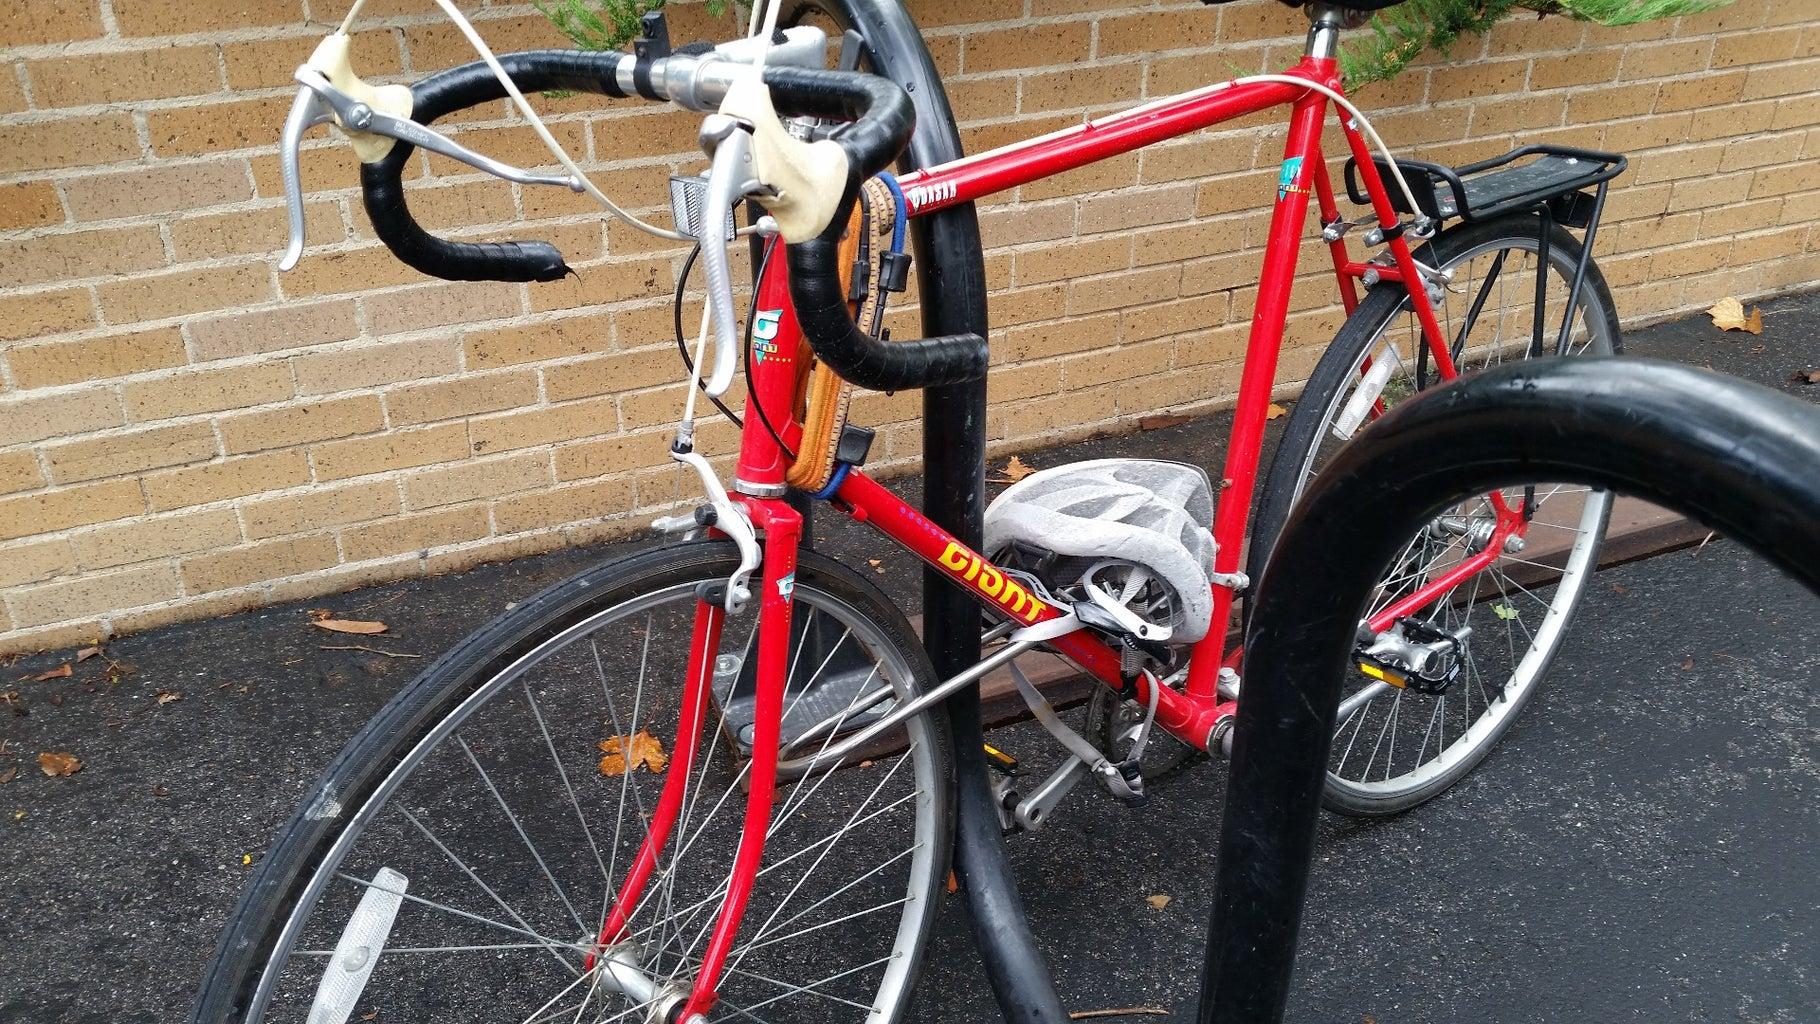 Lock Up That Bike!